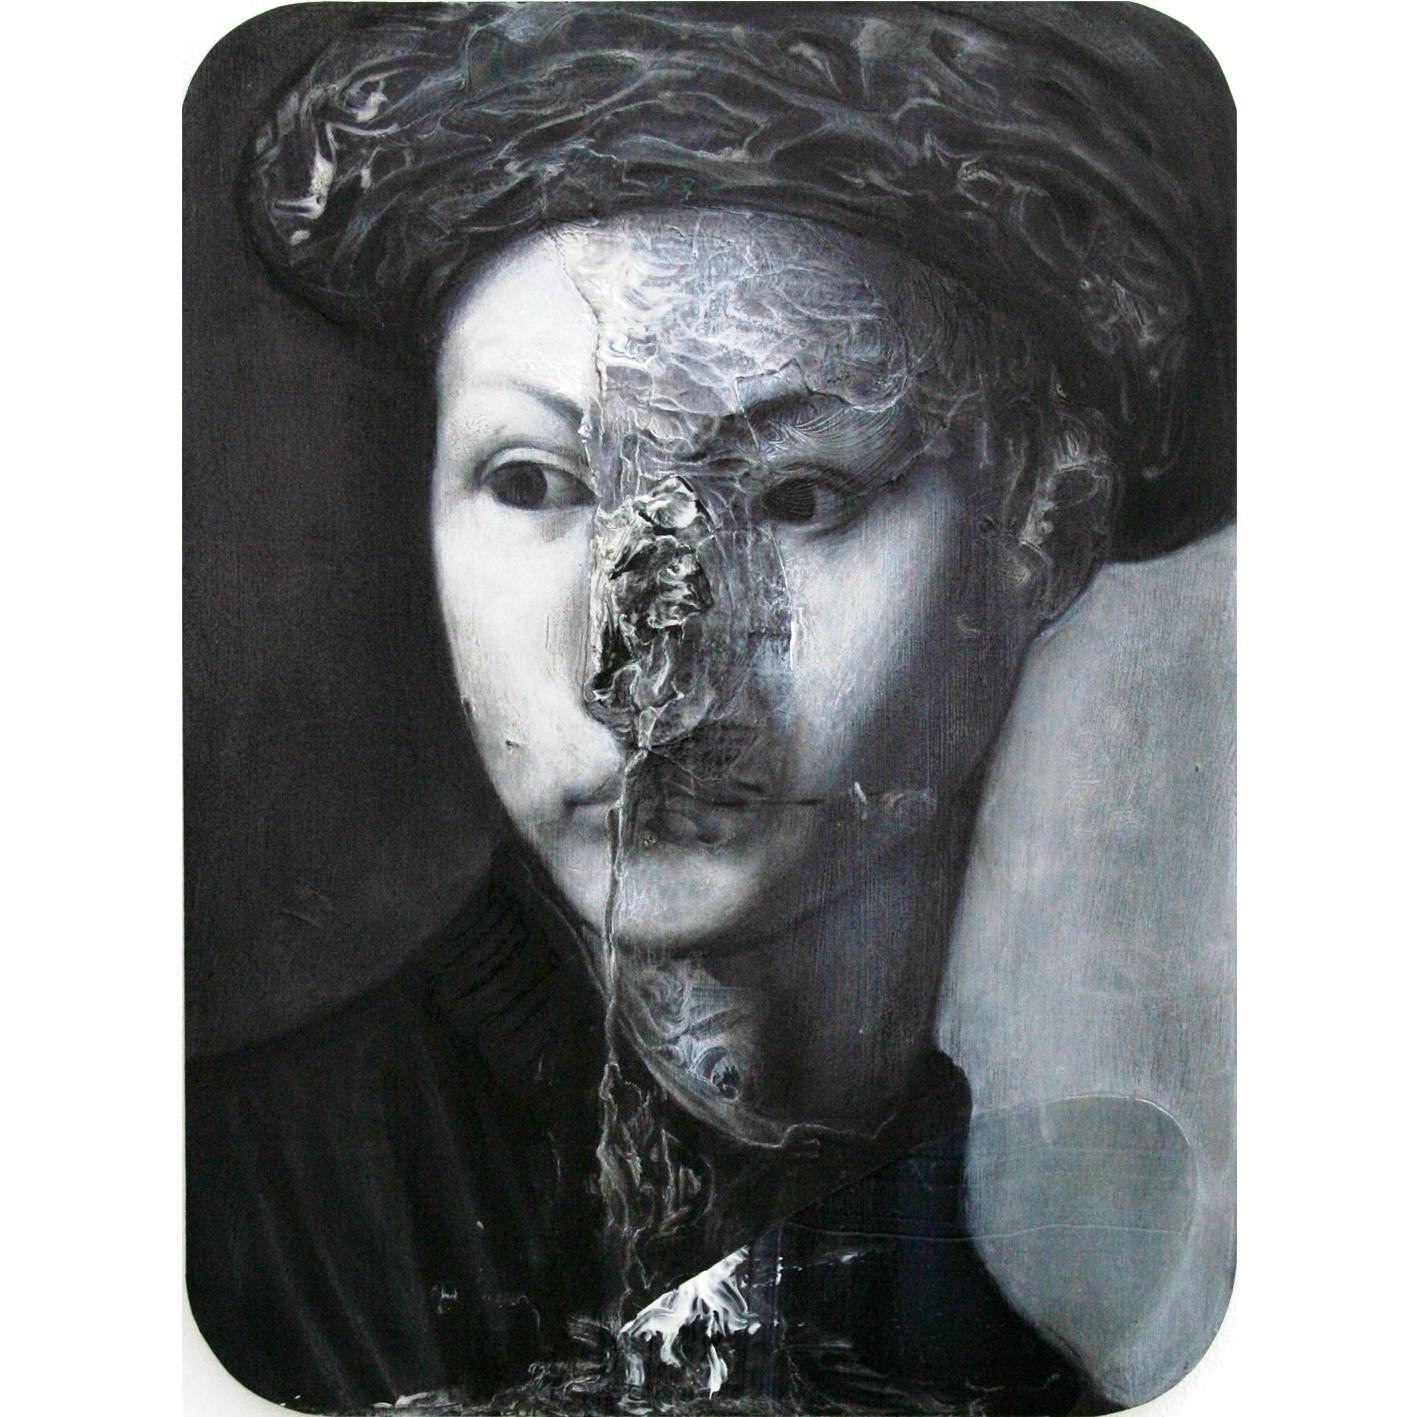 3) Untitled (2017) - 30x40cm - mixed media on wood - Copia